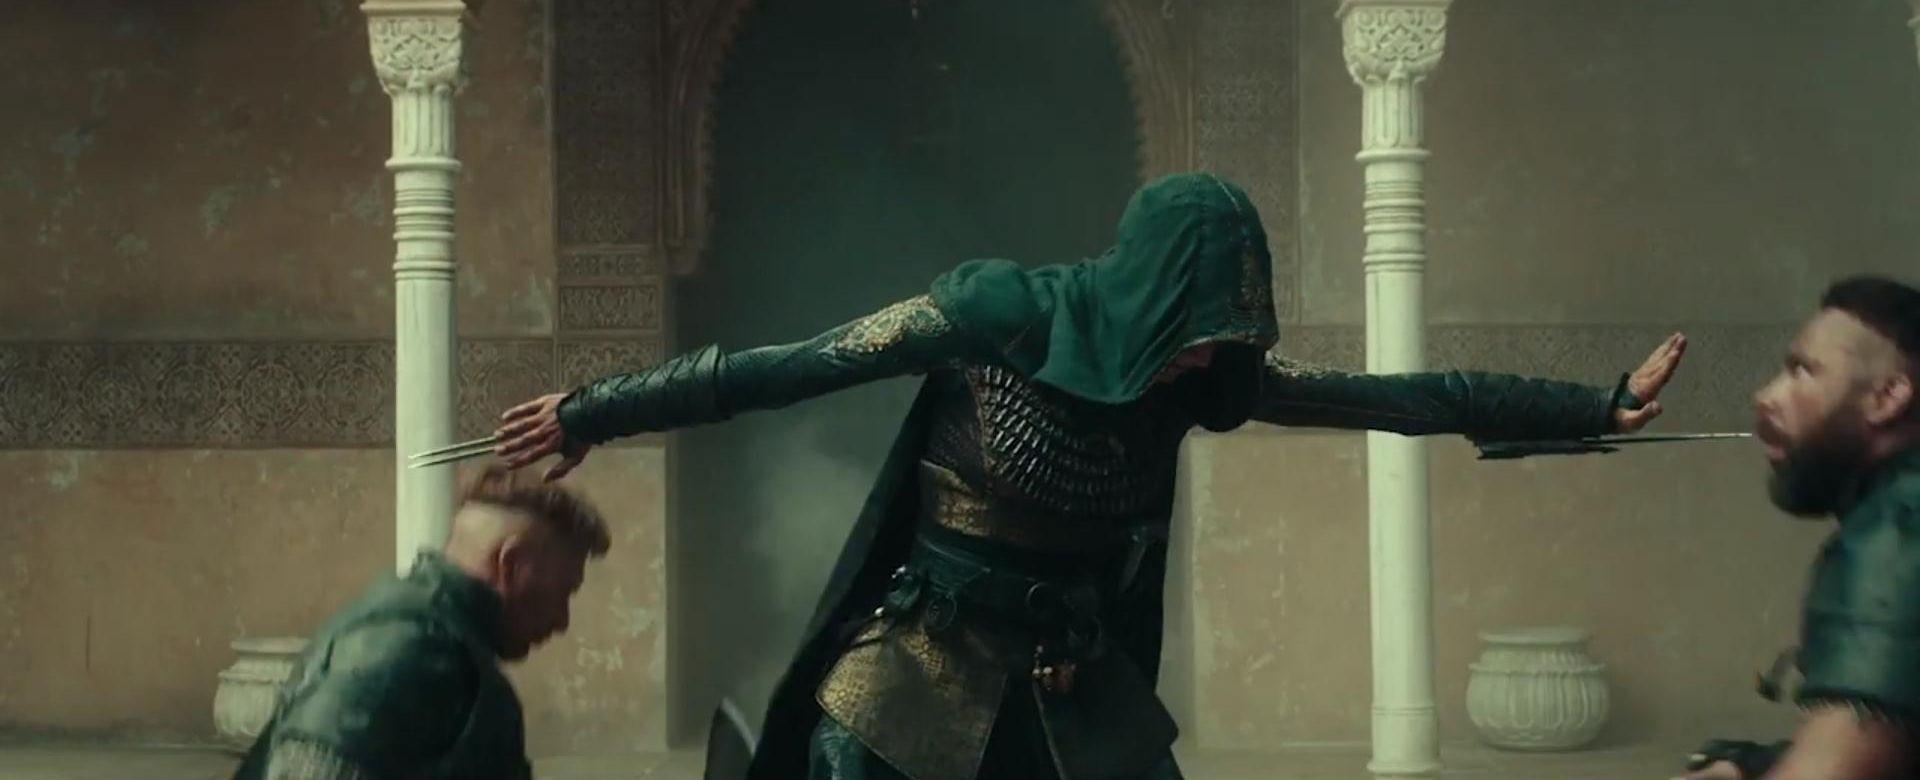 VIDEO: Objavljen prvi trailer za 'Assasin's Creed'